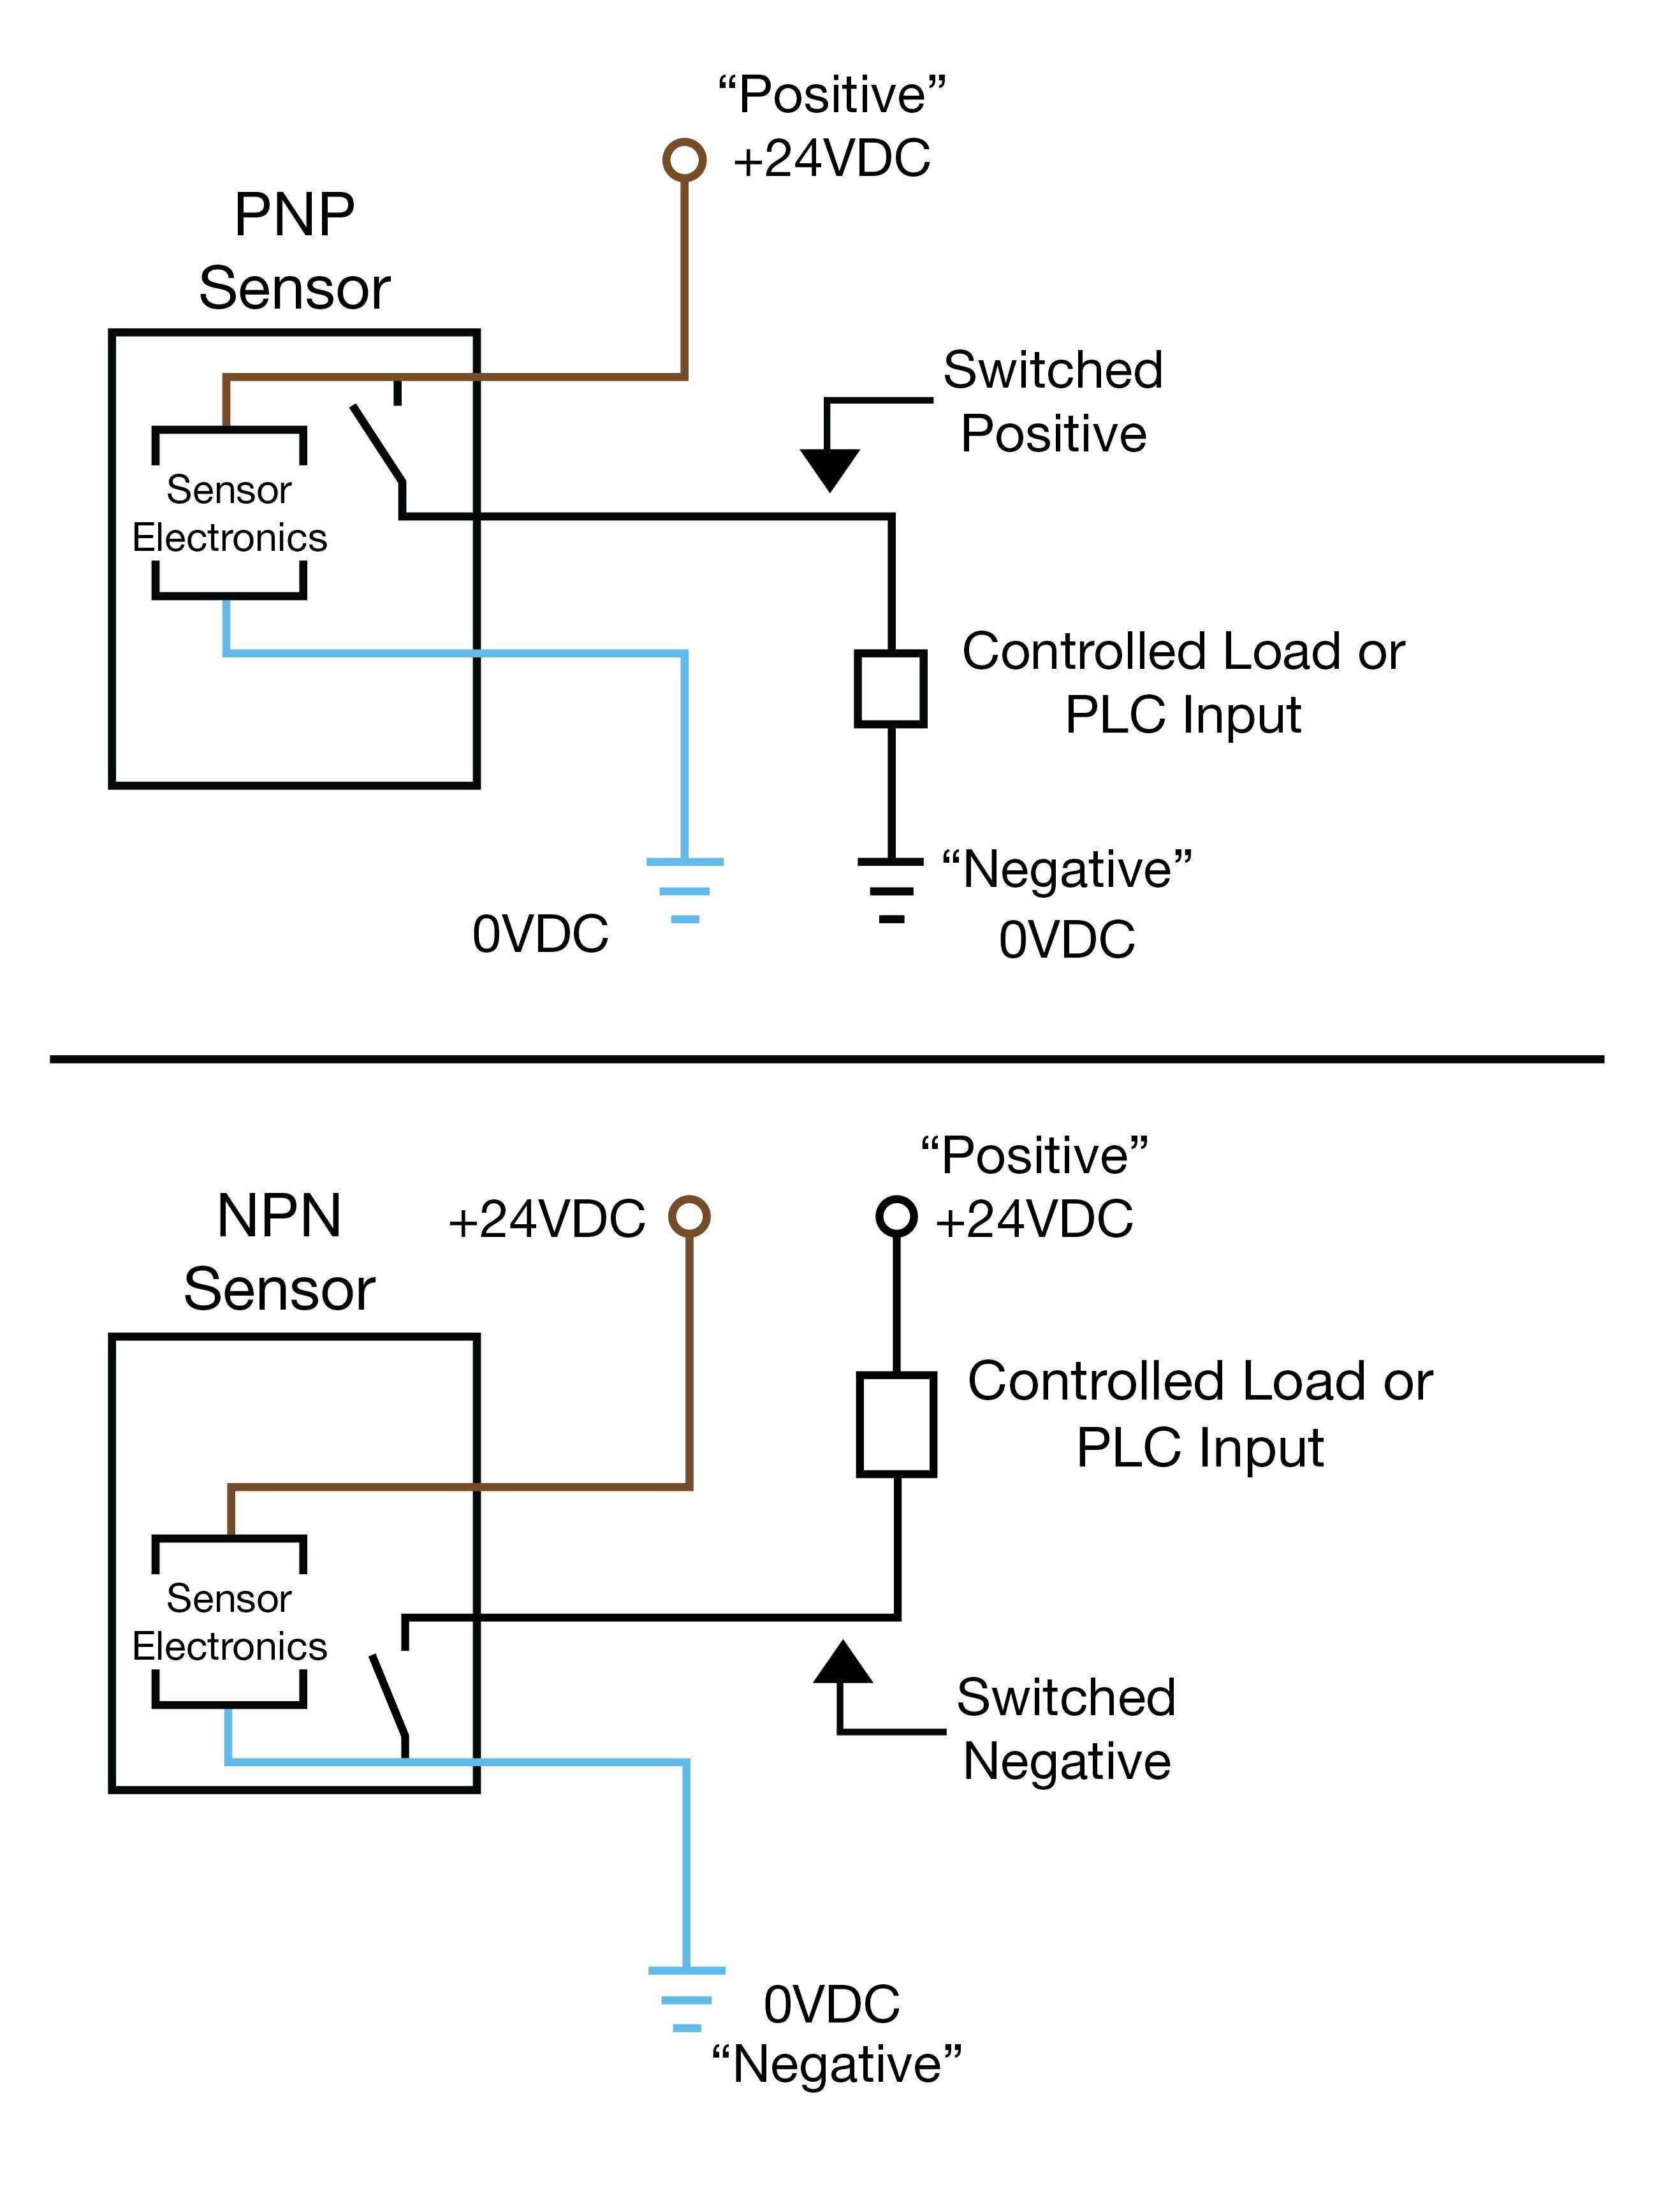 KX_6918] Prox Sensor Wiring Diagram Free Image Wiring Diagram Engine Schematic  WiringDupl Ynthe Remca Tobiq Viewor Mohammedshrine Librar Wiring 101